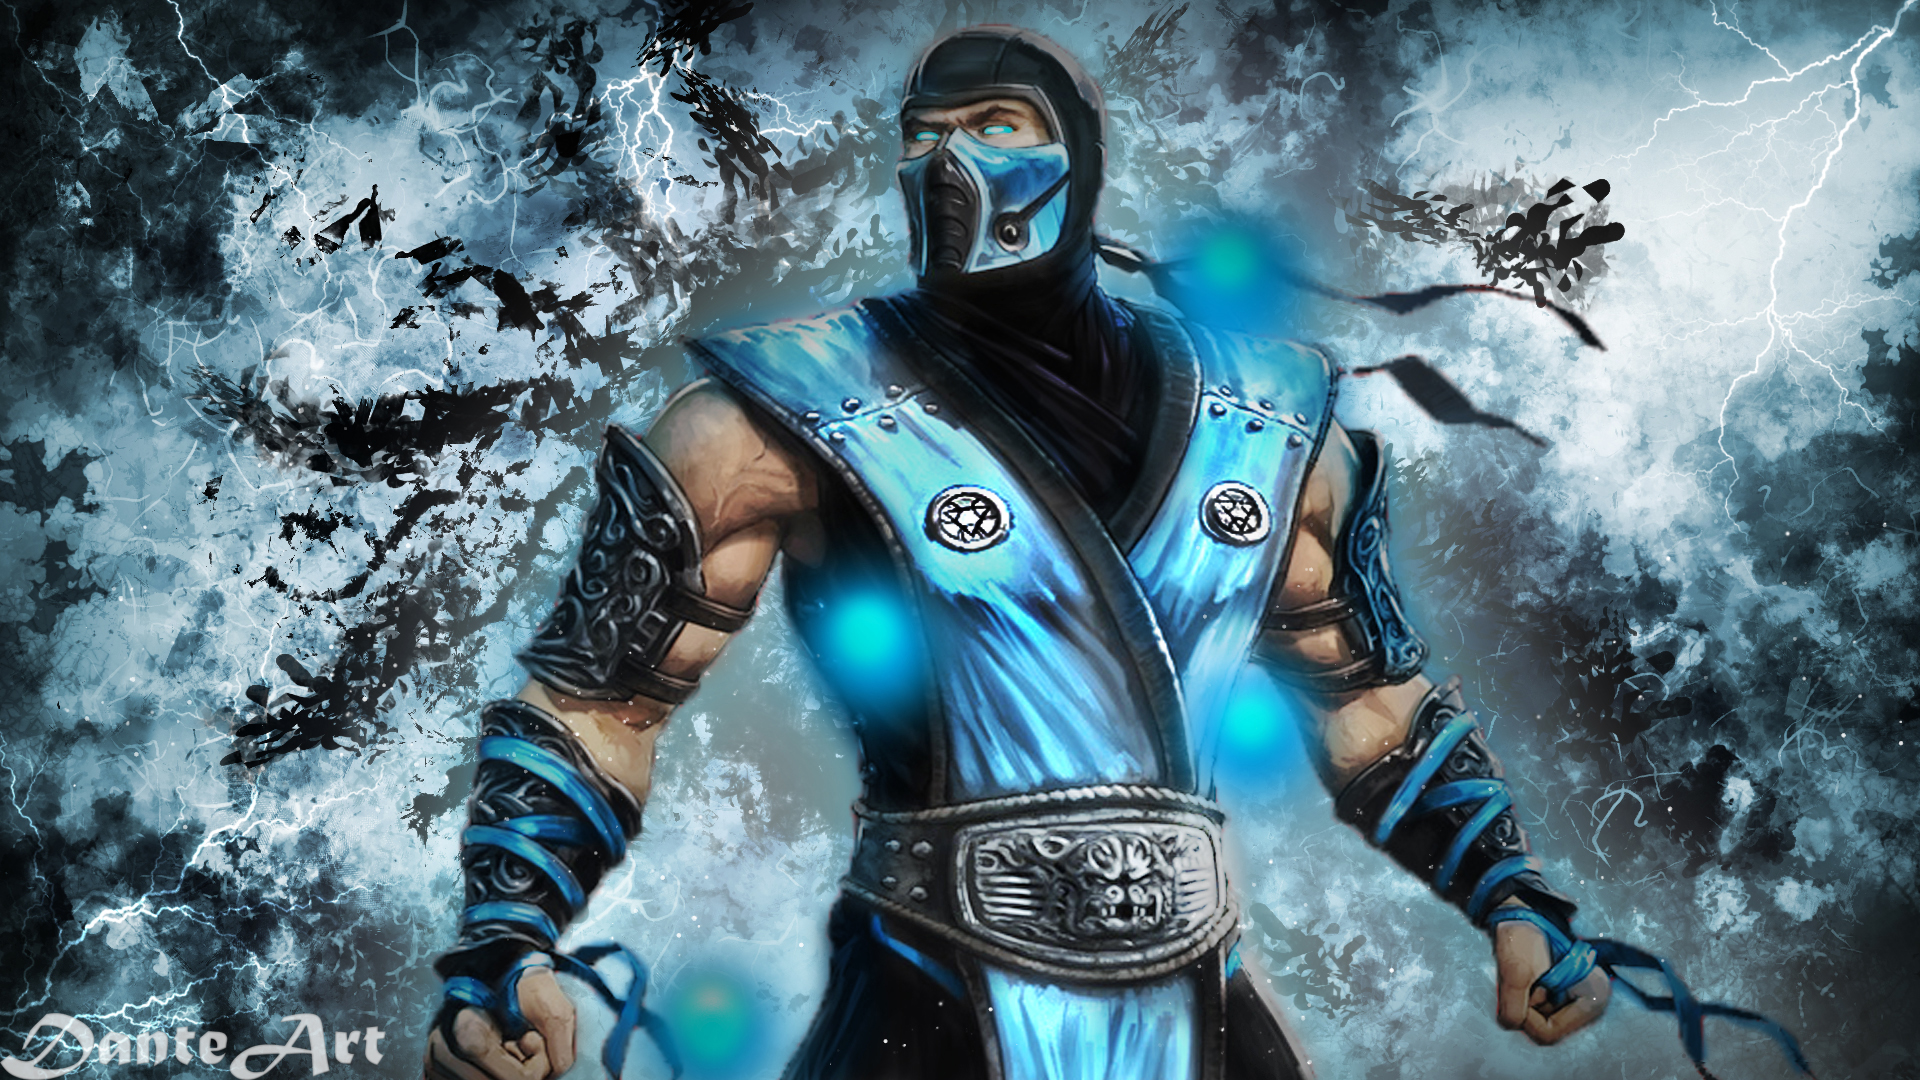 Mortal Kombat Wallpaper High Definition